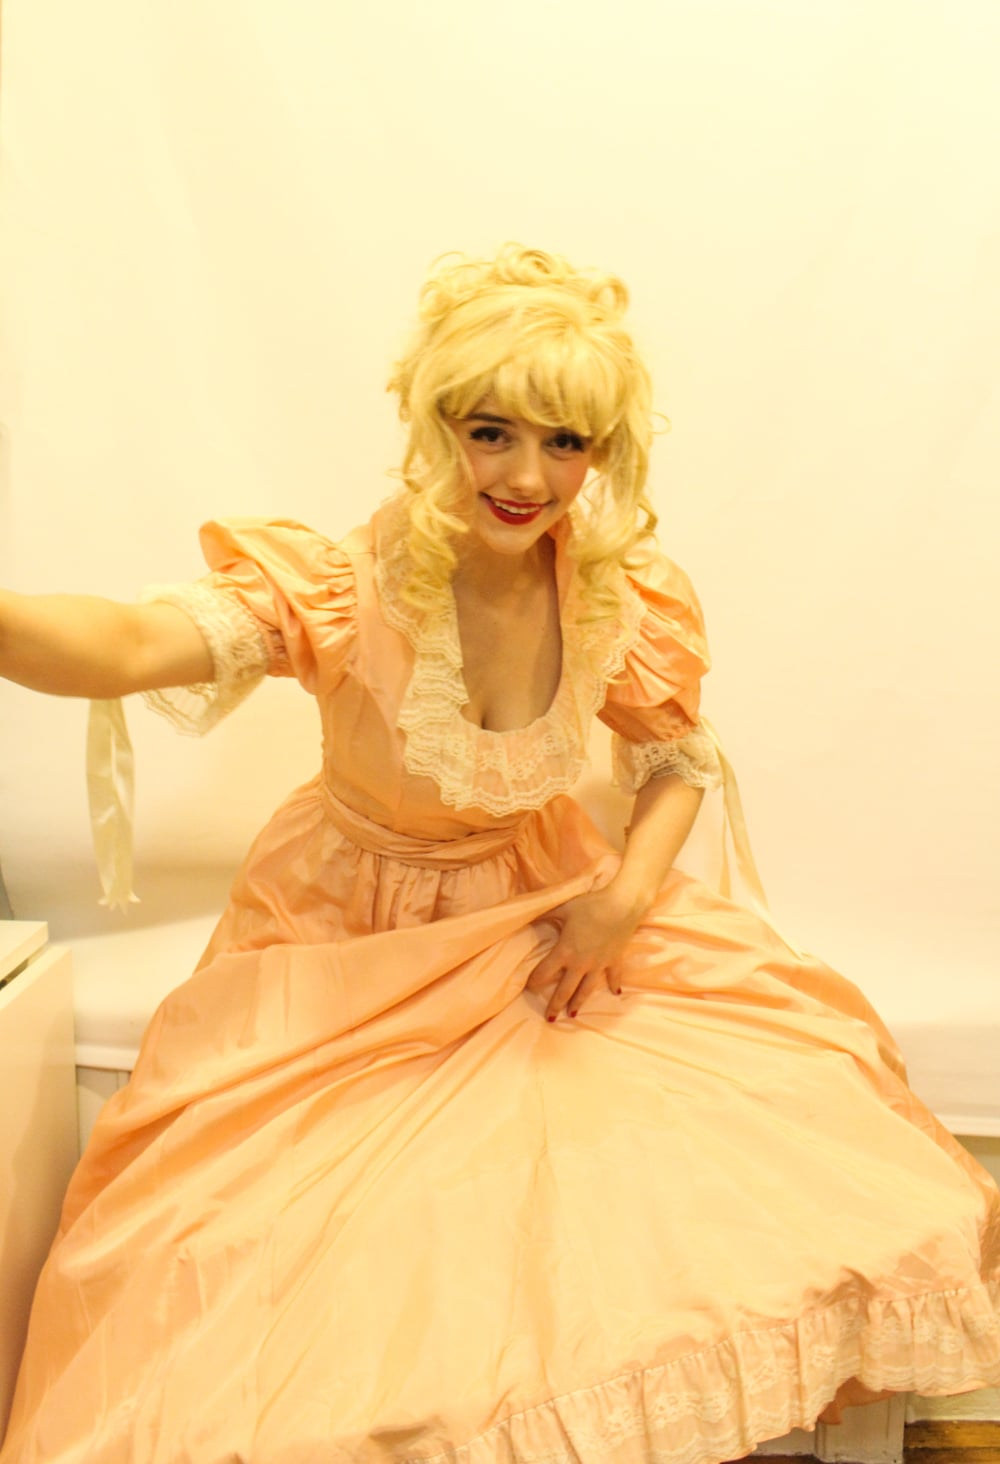 1800s pink dress edited 2.jpg